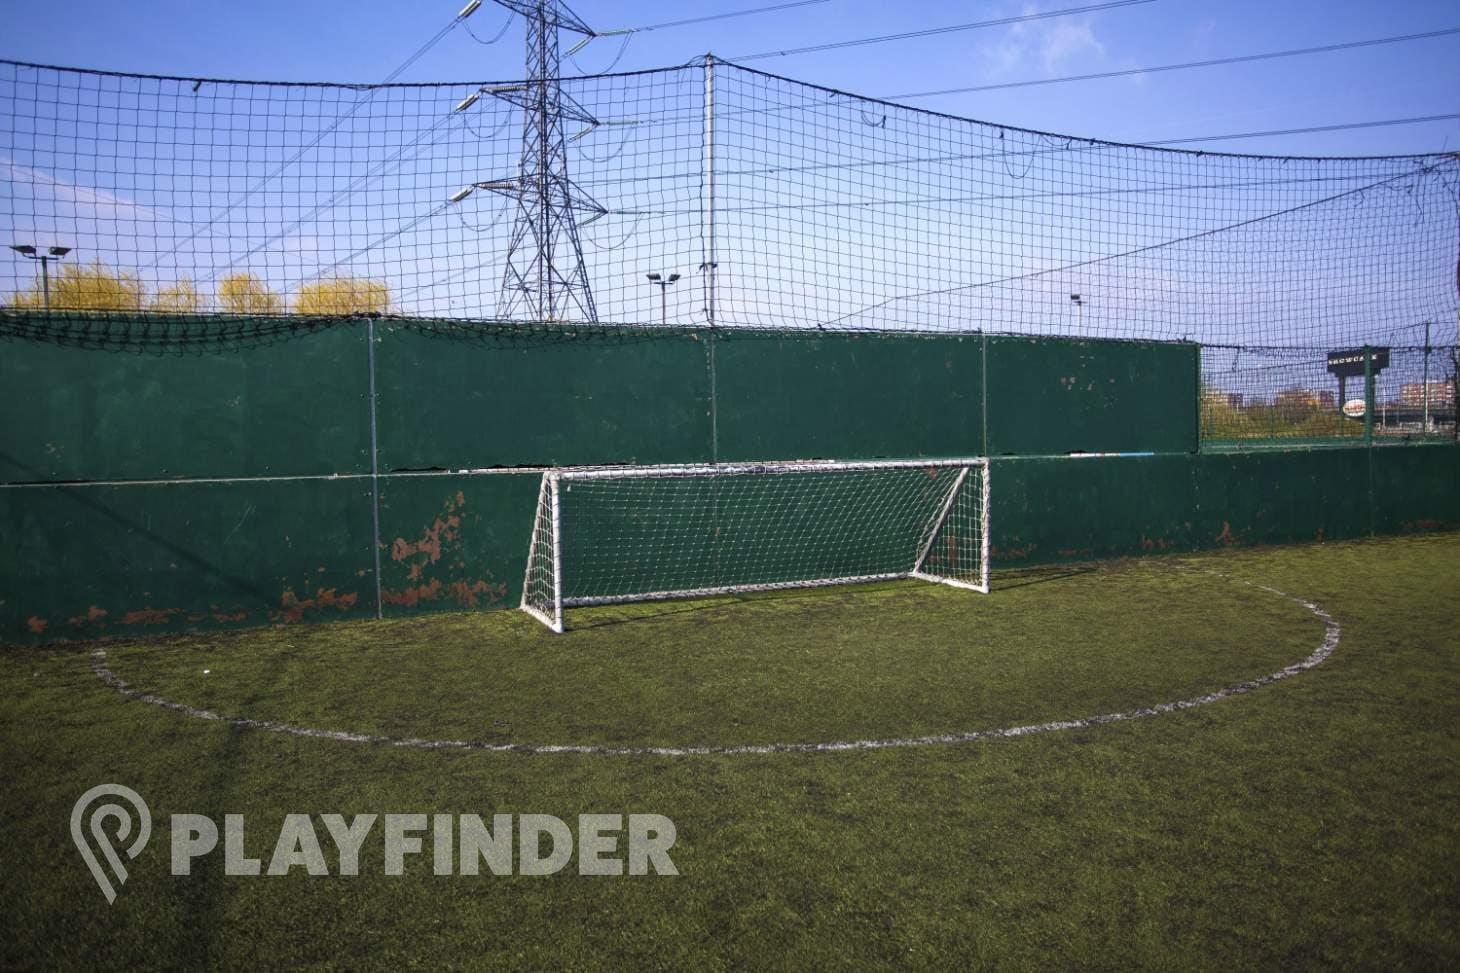 Powerleague Stoke 5 a side | 3G Astroturf football pitch